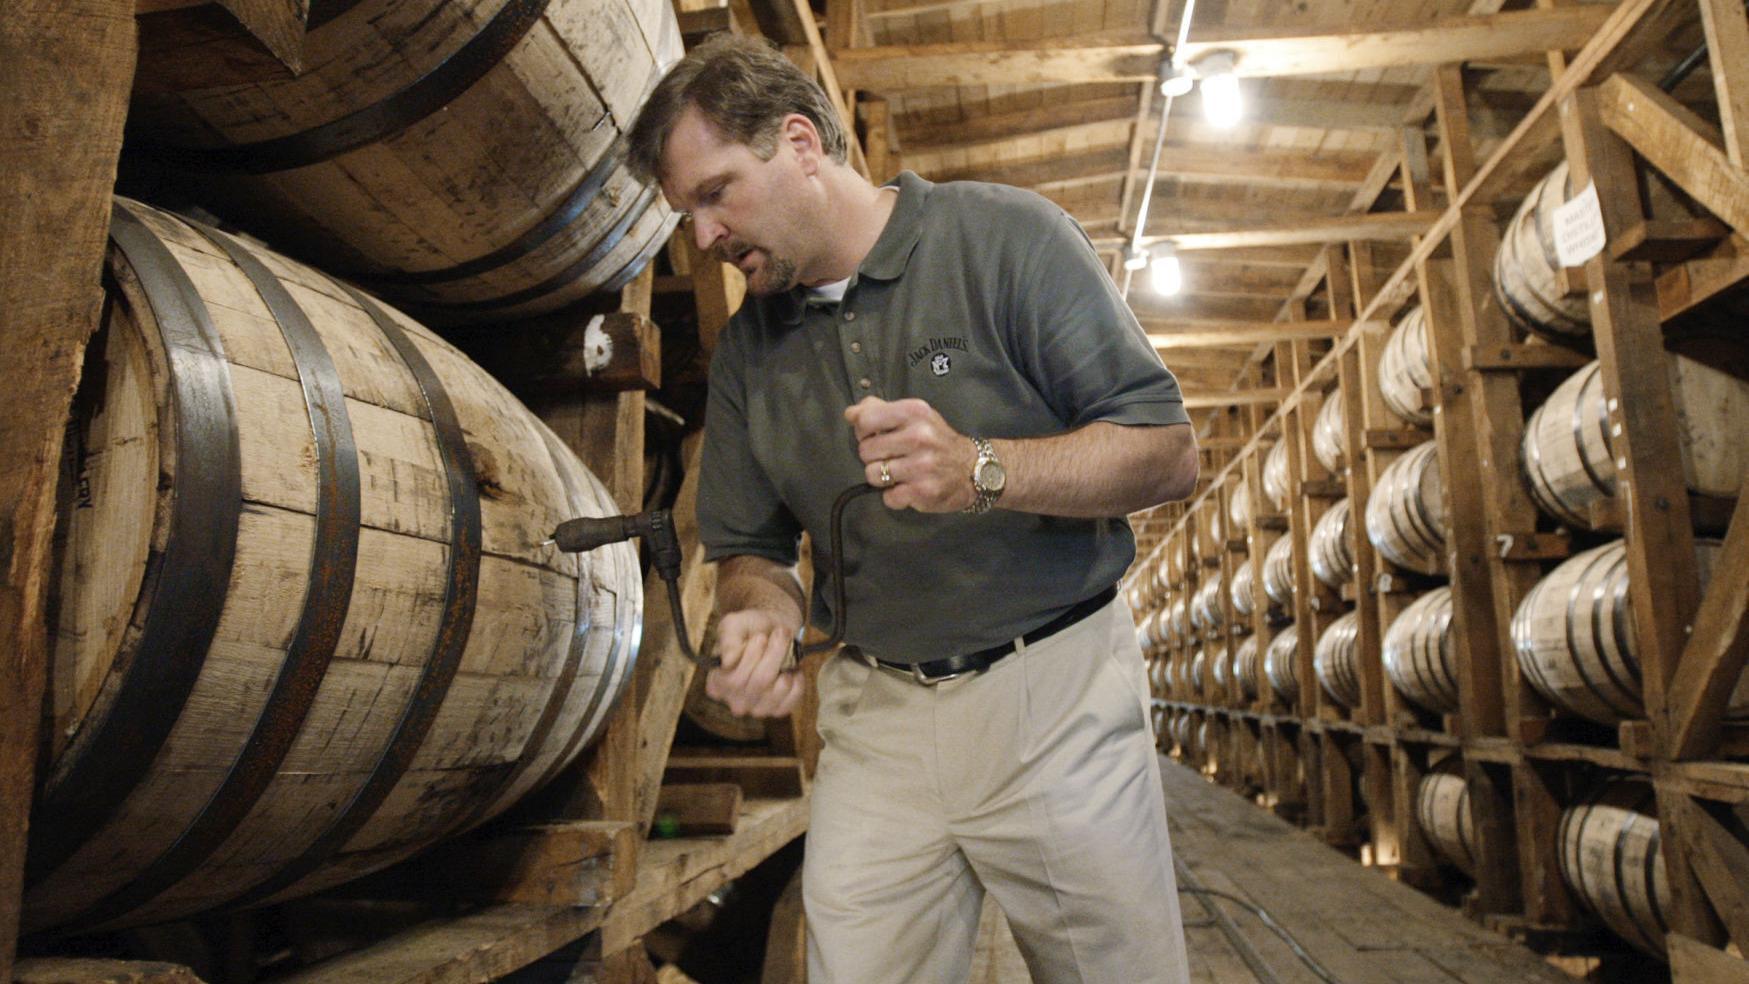 Clayton, former Jack Daniel's master distiller to announce Blount venture